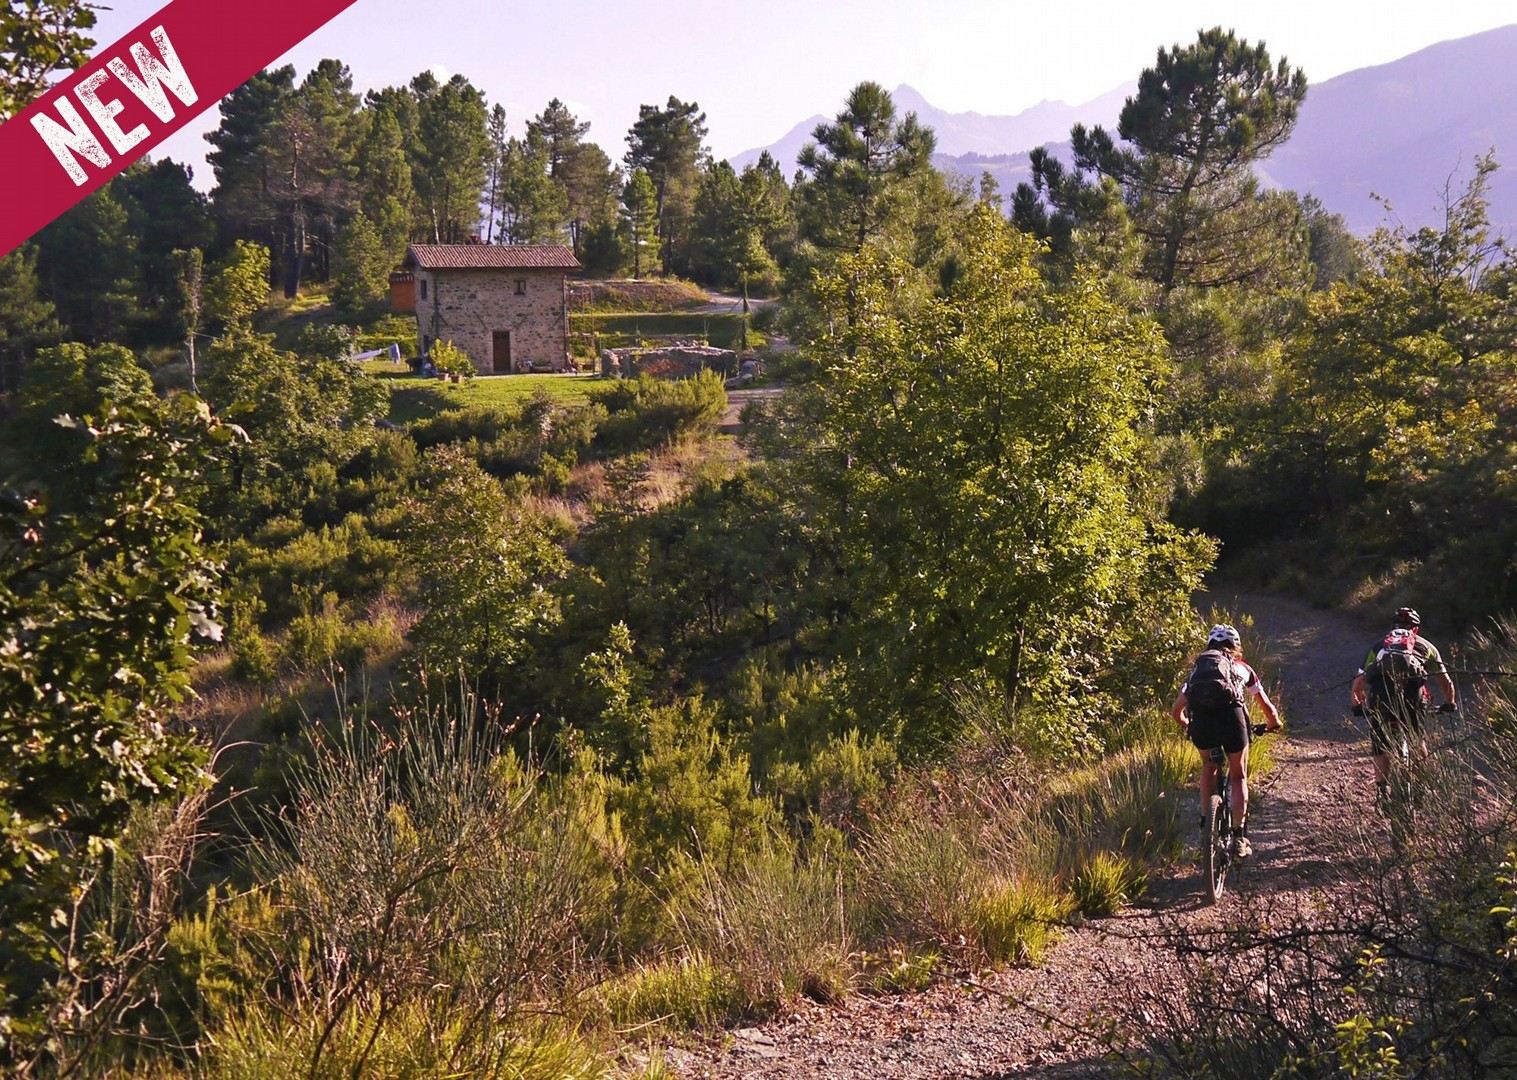 via-francigena-tuscany-to-rome-self-guided-mountain-bike-holiday.jpg - Italy - Via Francigena (Tuscany to Rome) - Self-Guided Mountain Bike Holiday - Mountain Biking